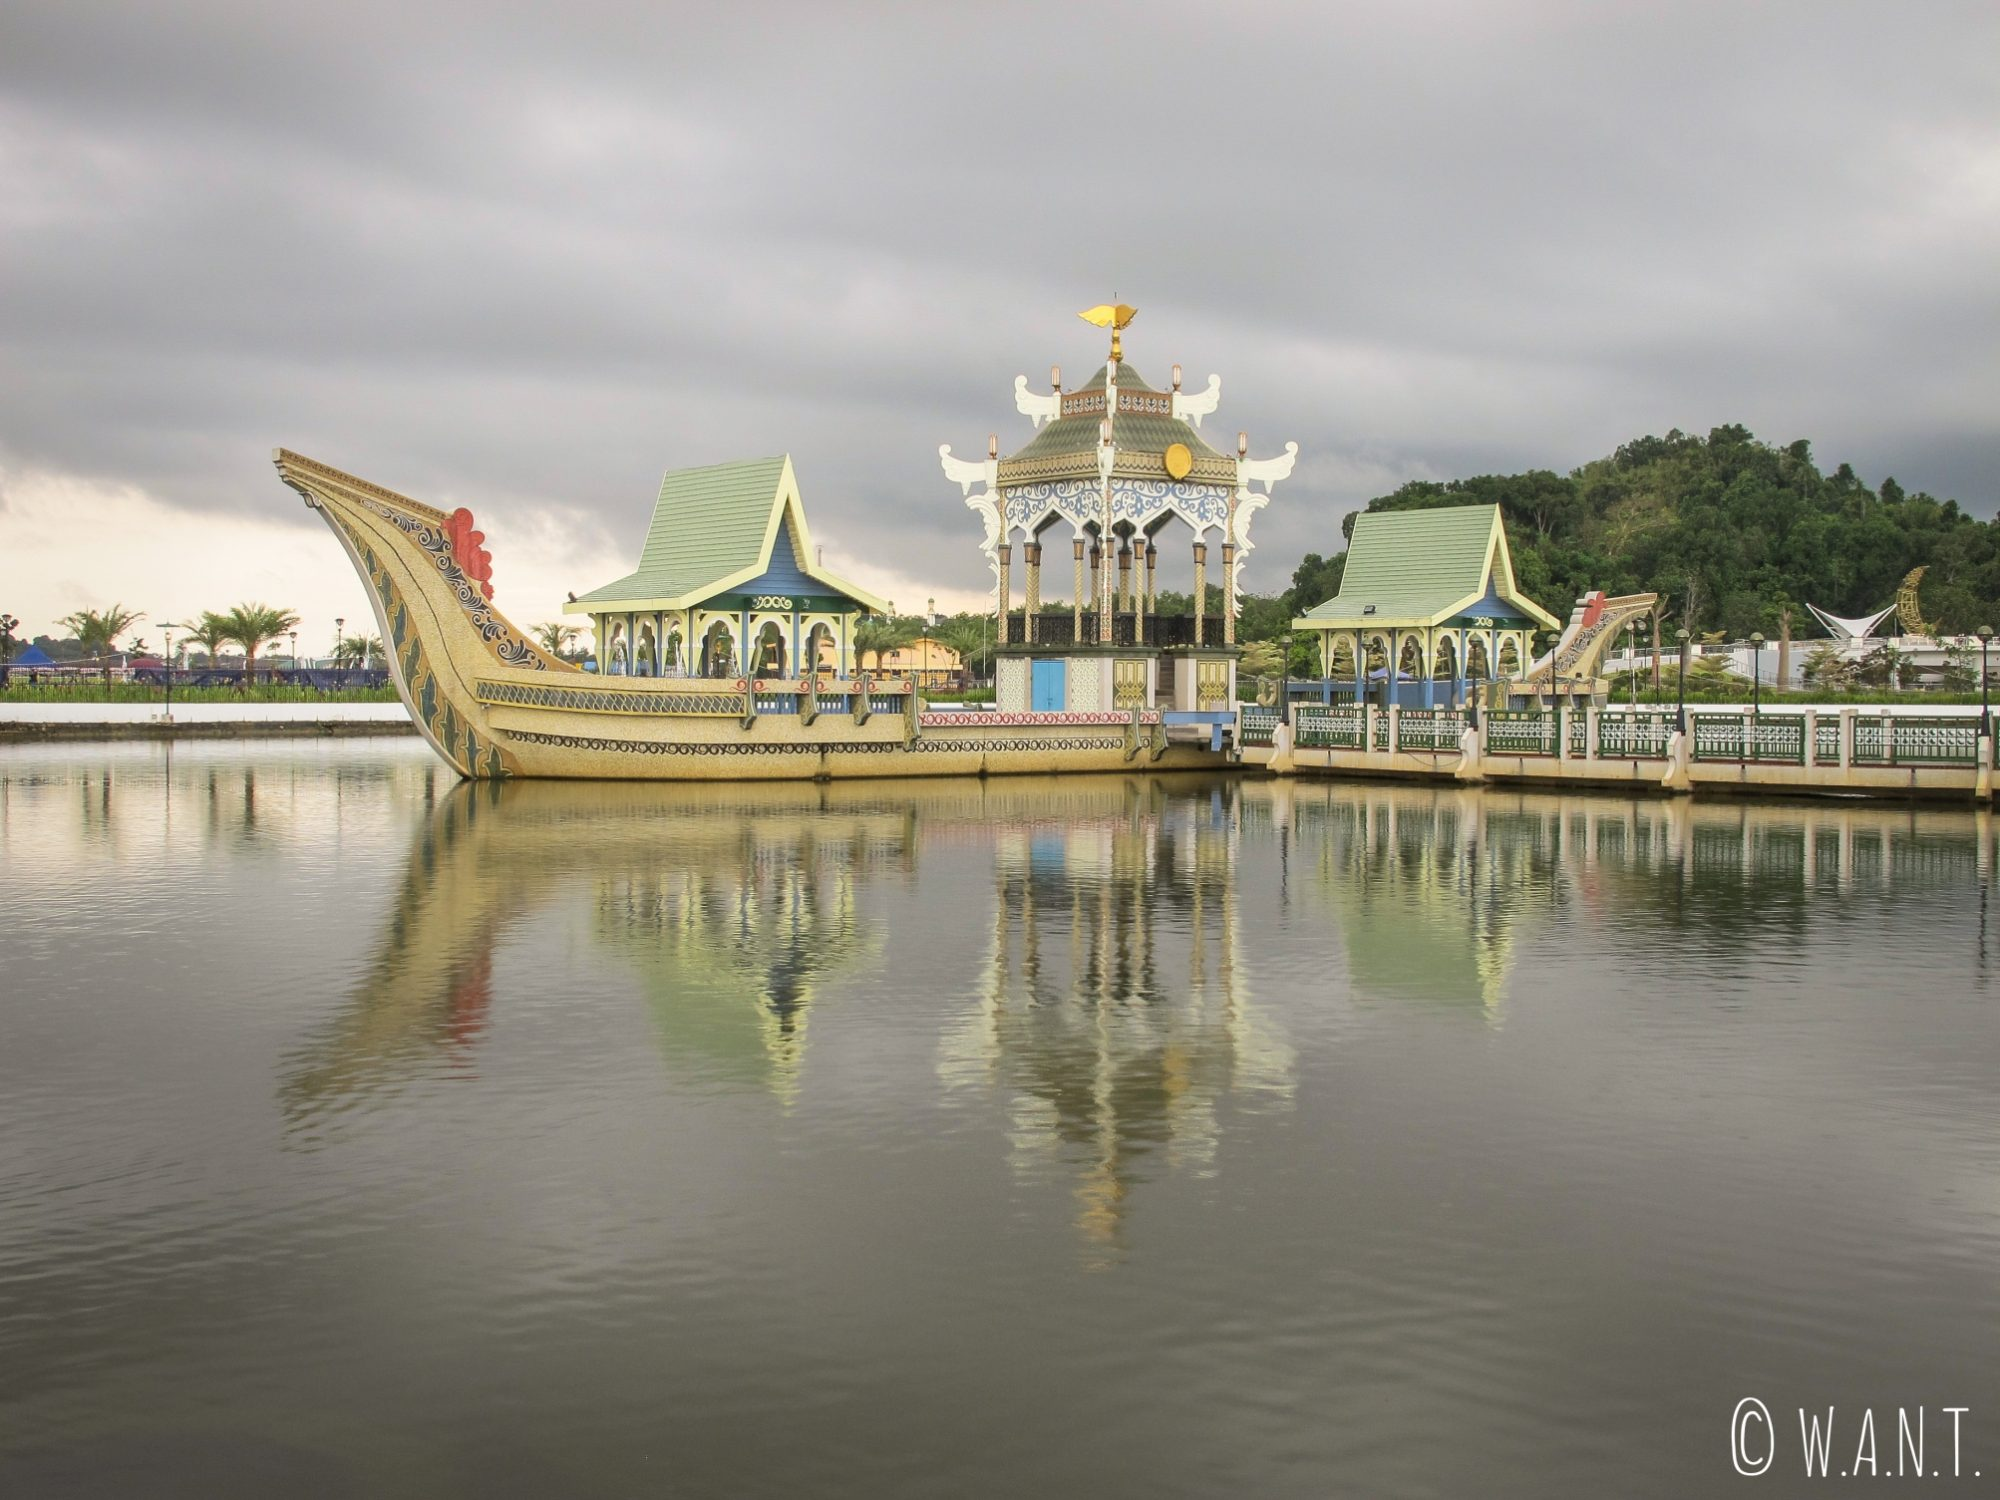 Barge de cérémonie de la mosquée Masjid Omar Ali Saifuddien de Bandar Seri Begawan